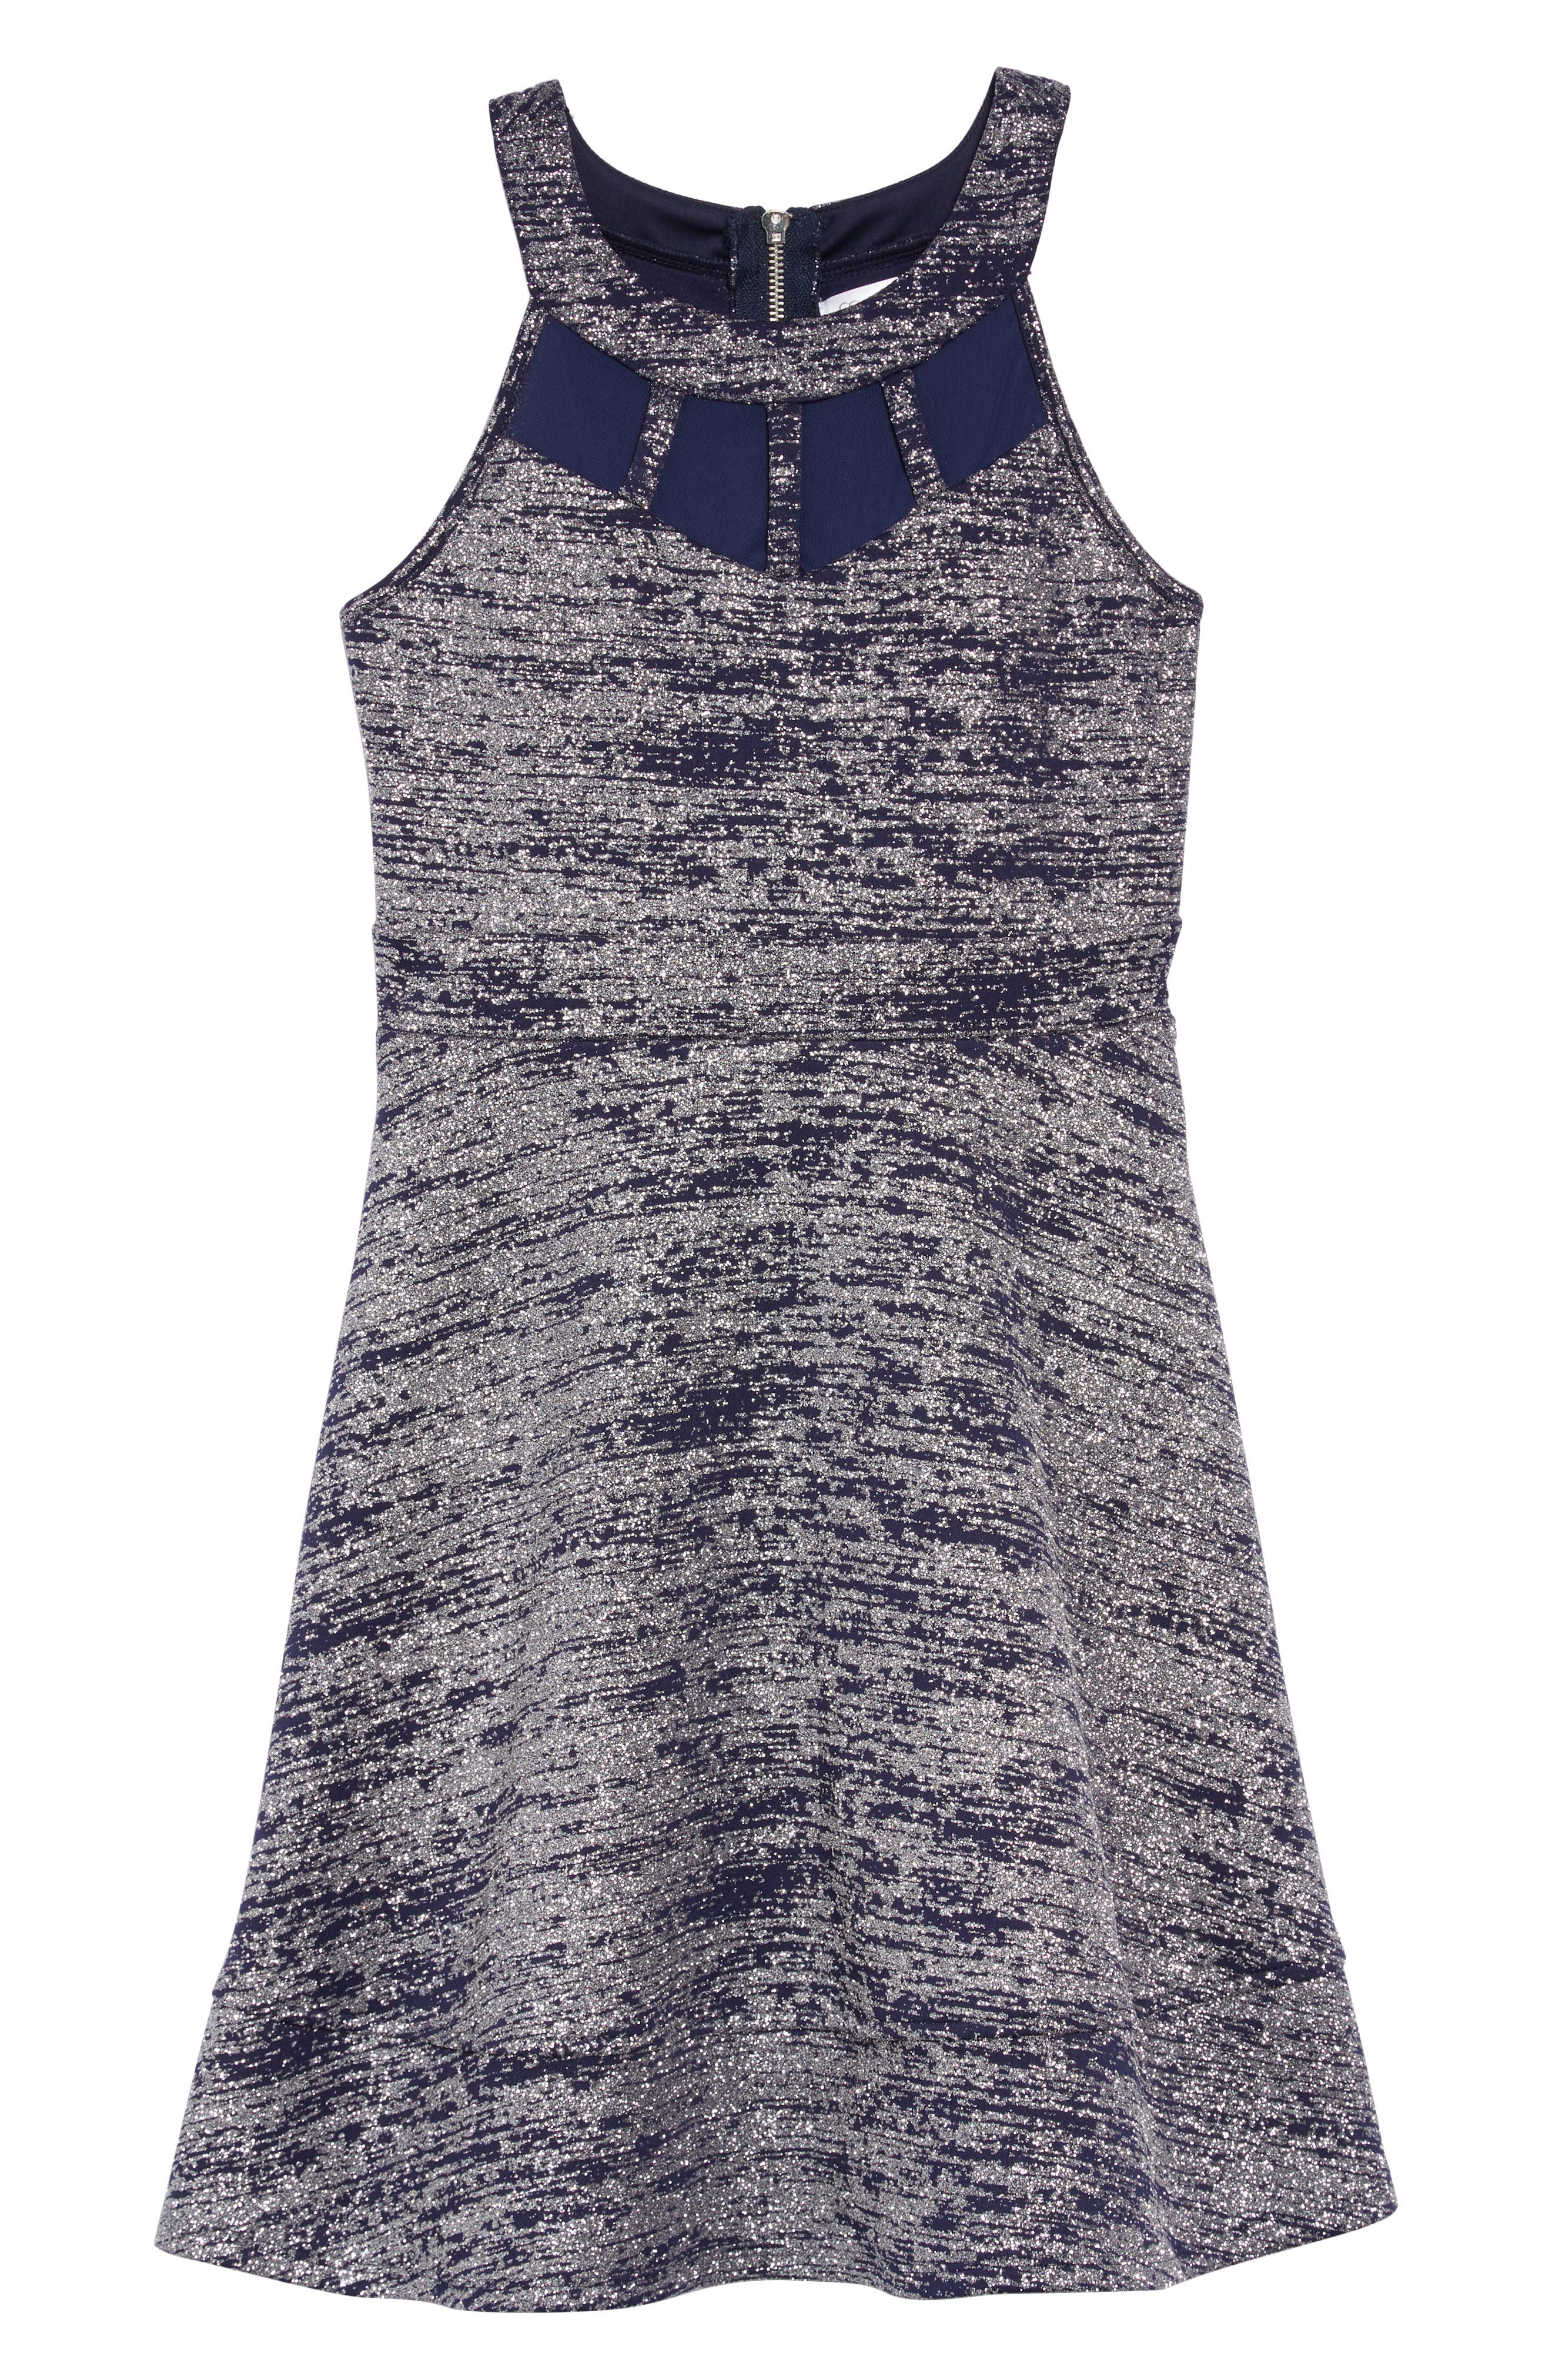 Glitter Illusion Neck Scuba Dress,                             Main thumbnail 1, color,                             NAVY/ SILVER